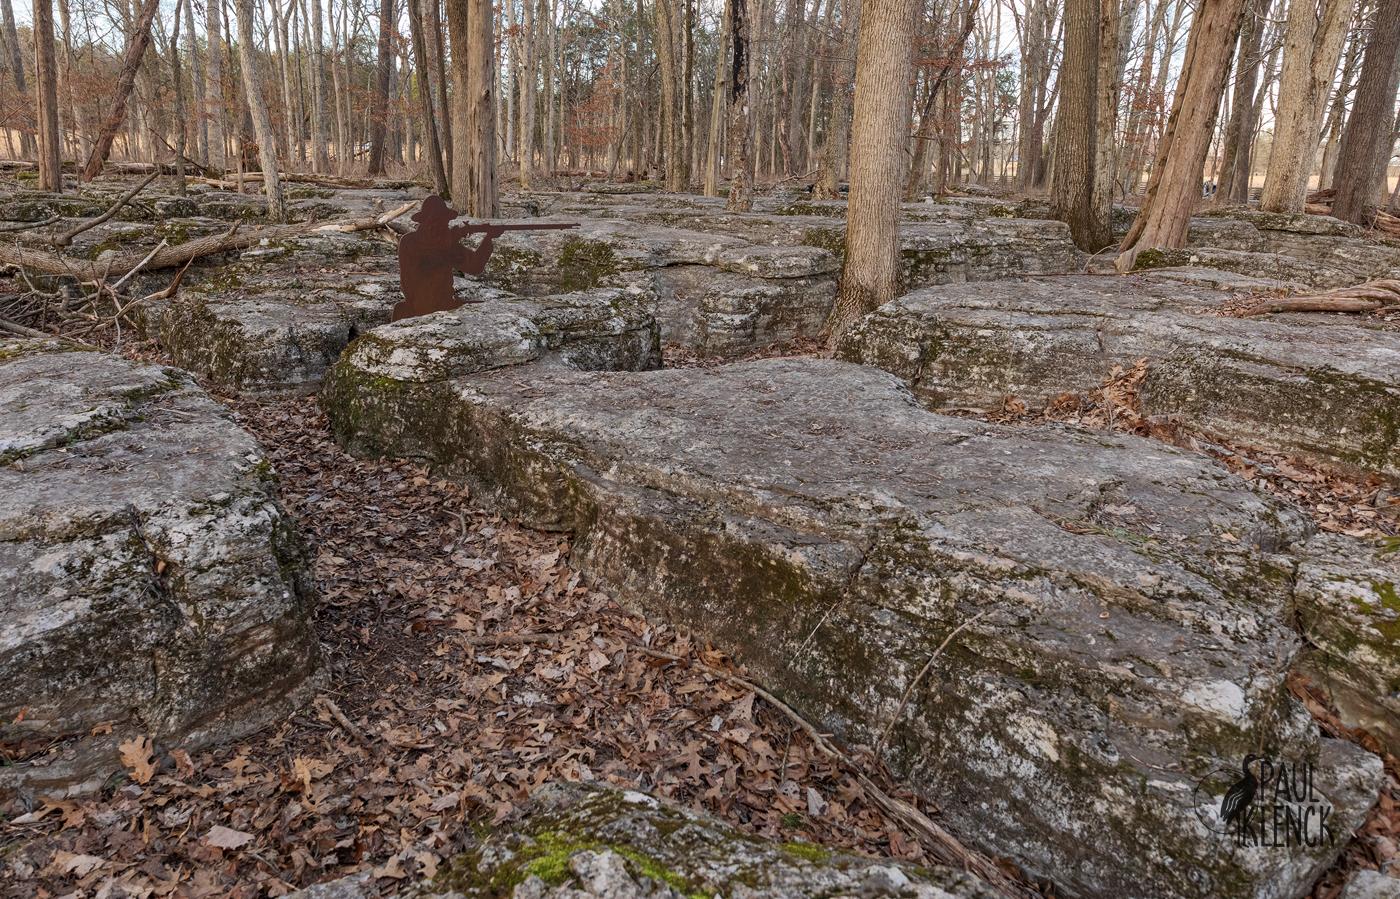 Slaughter Pen, Stones River National Battlefield, Tennessee